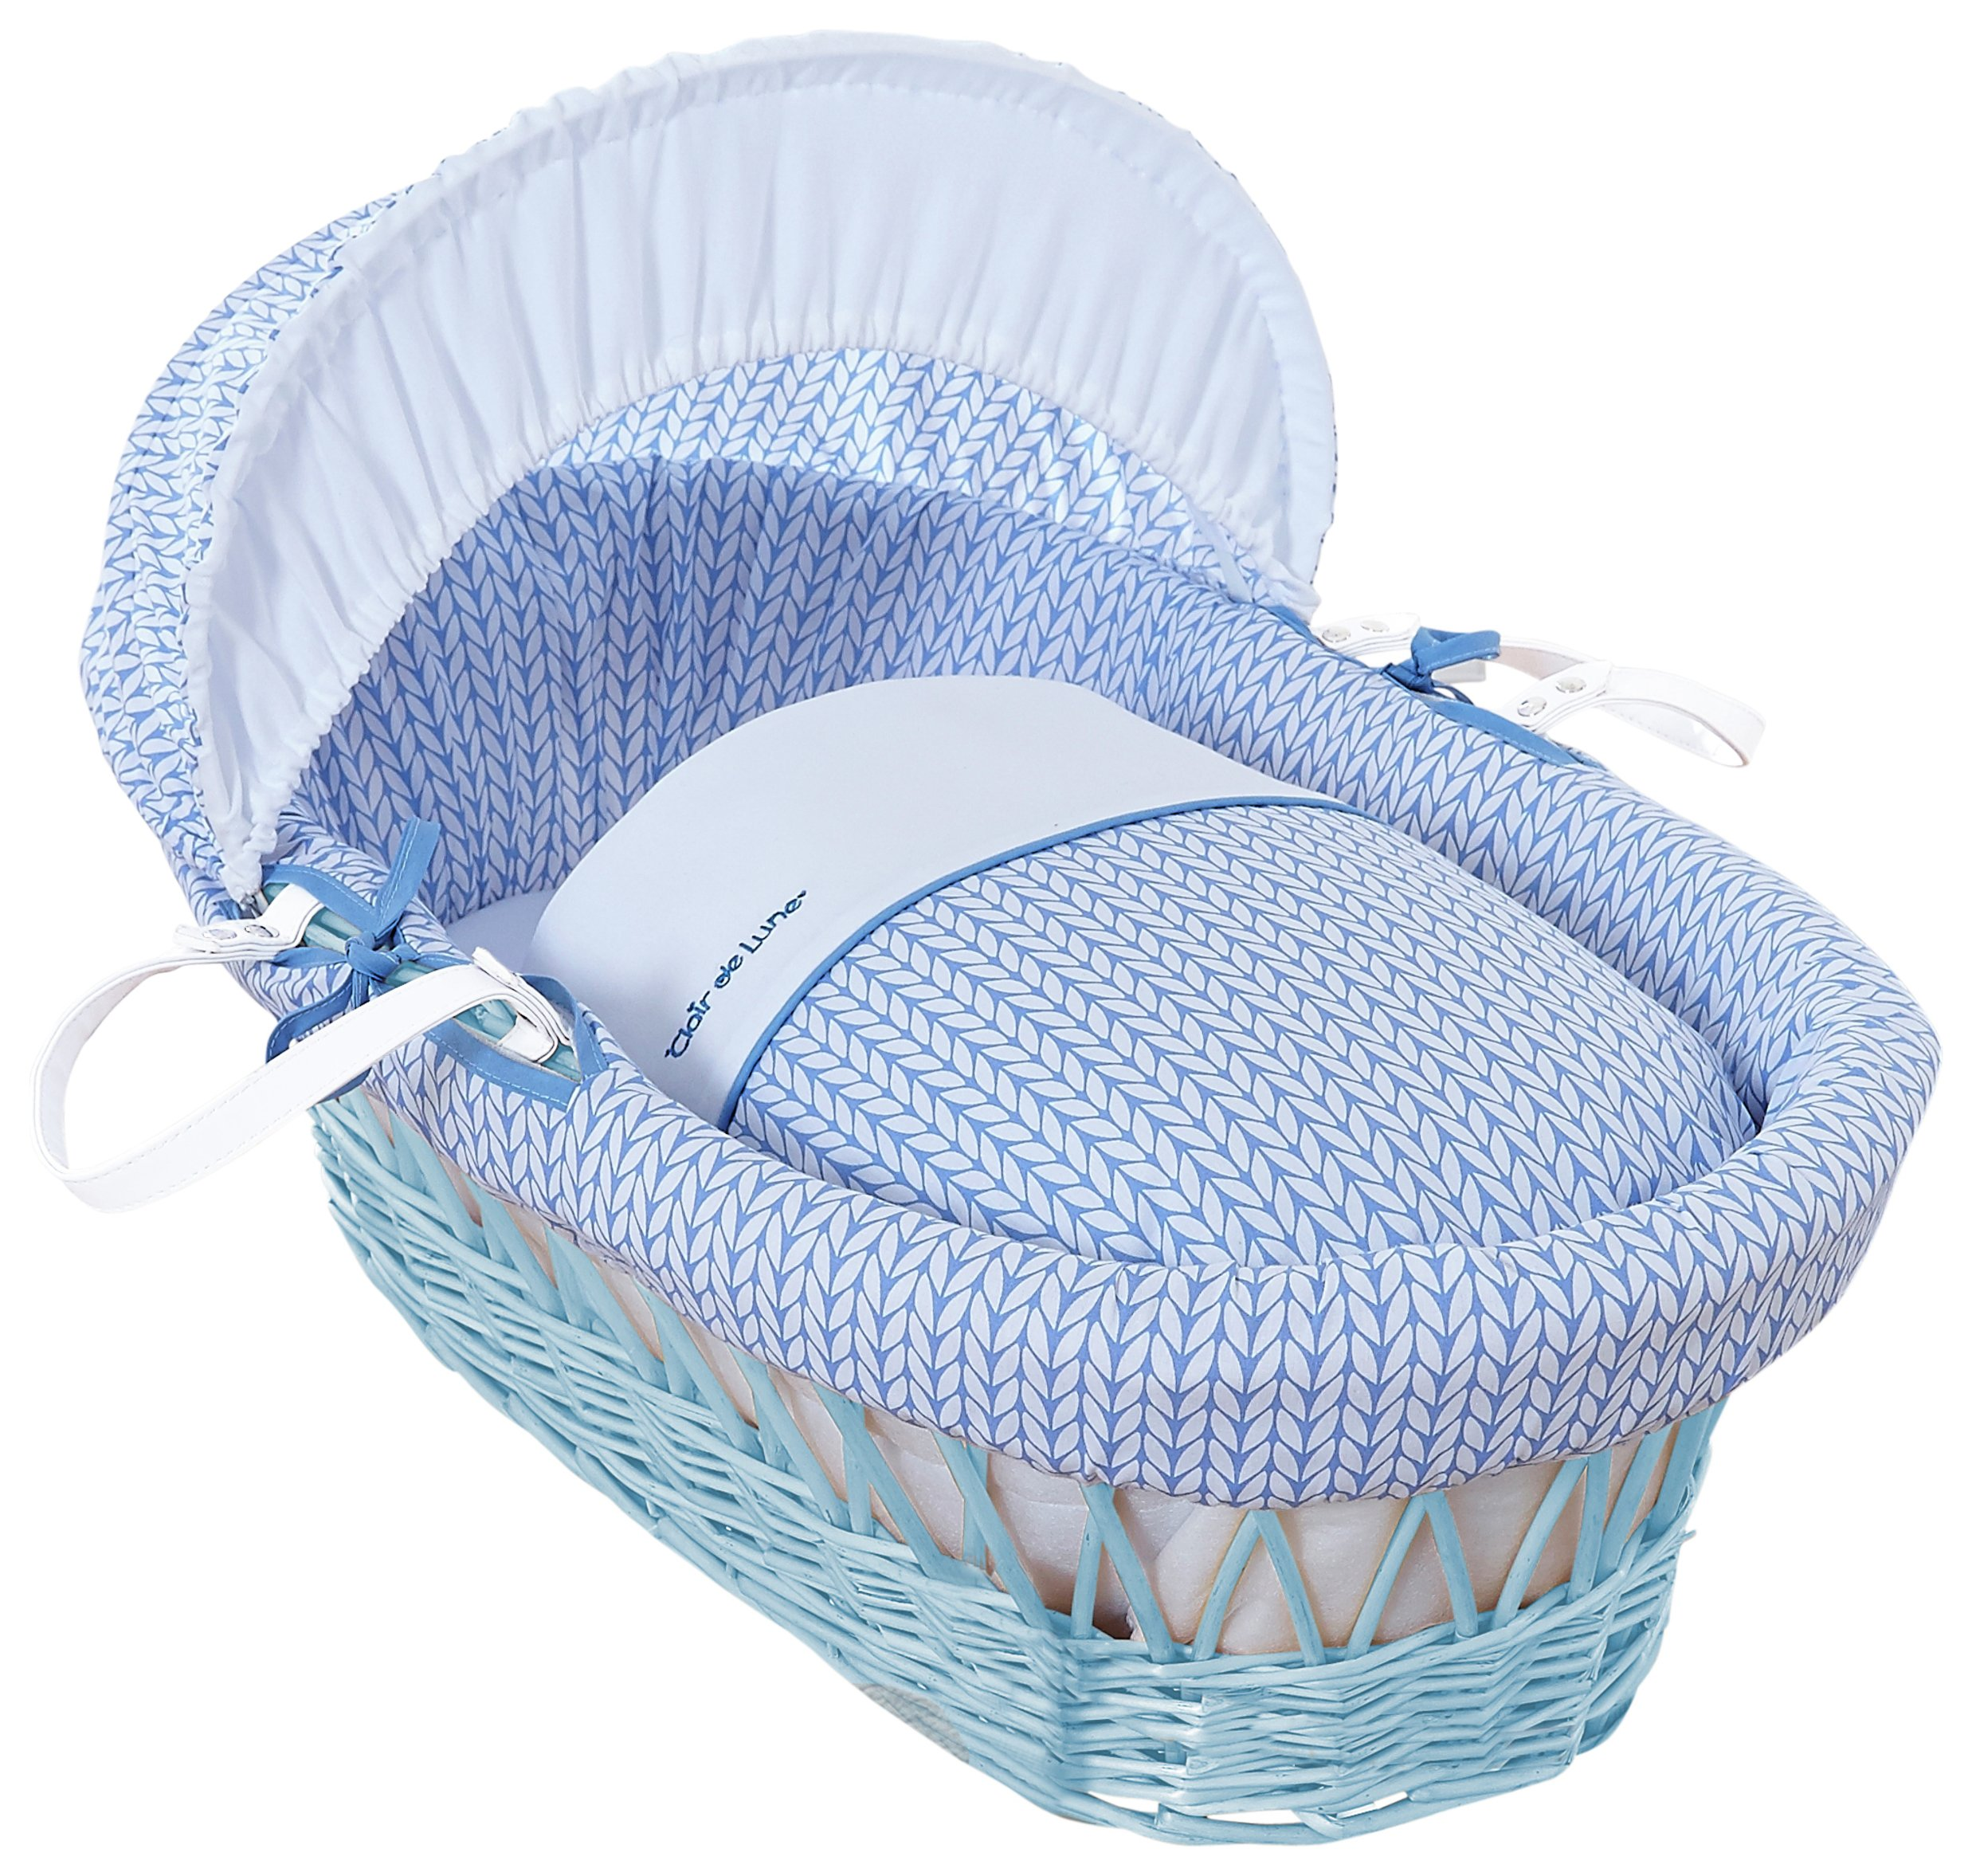 Image of Clair de Lune Blue Barley B??b?? Blue Wicker Moses Basket